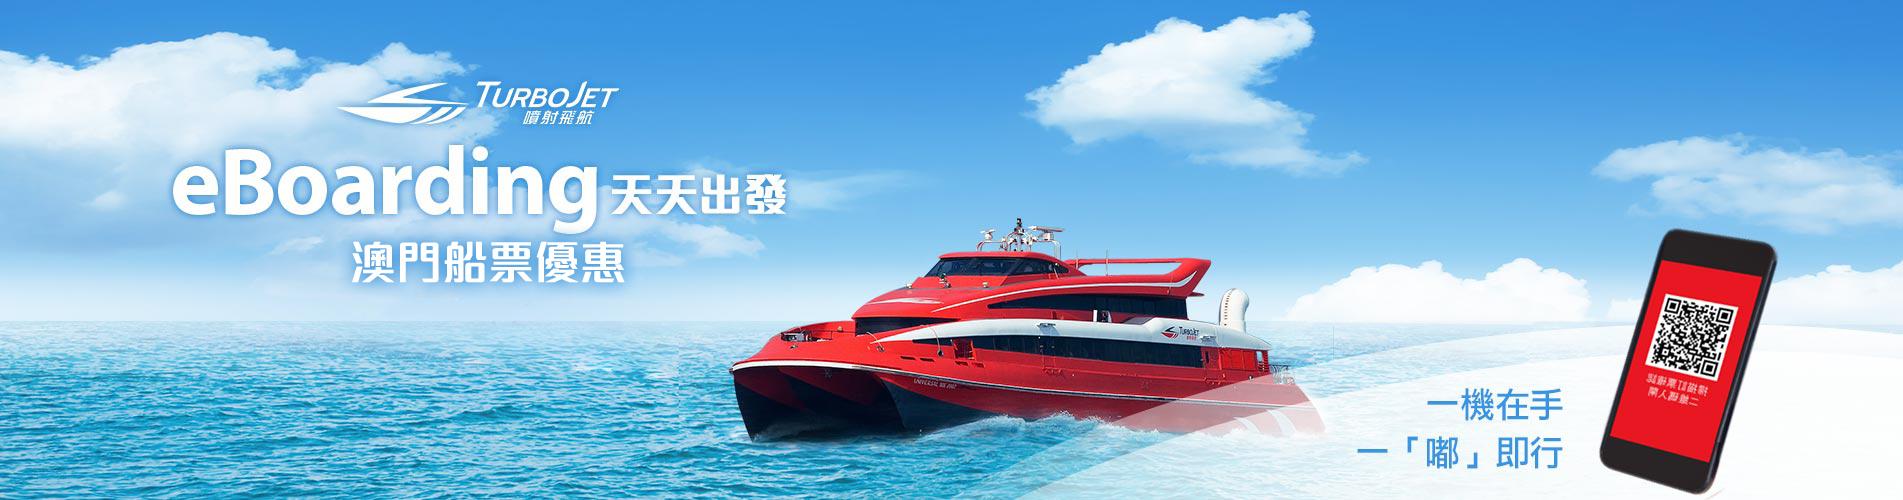 TurboJET eBoarding船票 (即日來回優惠)